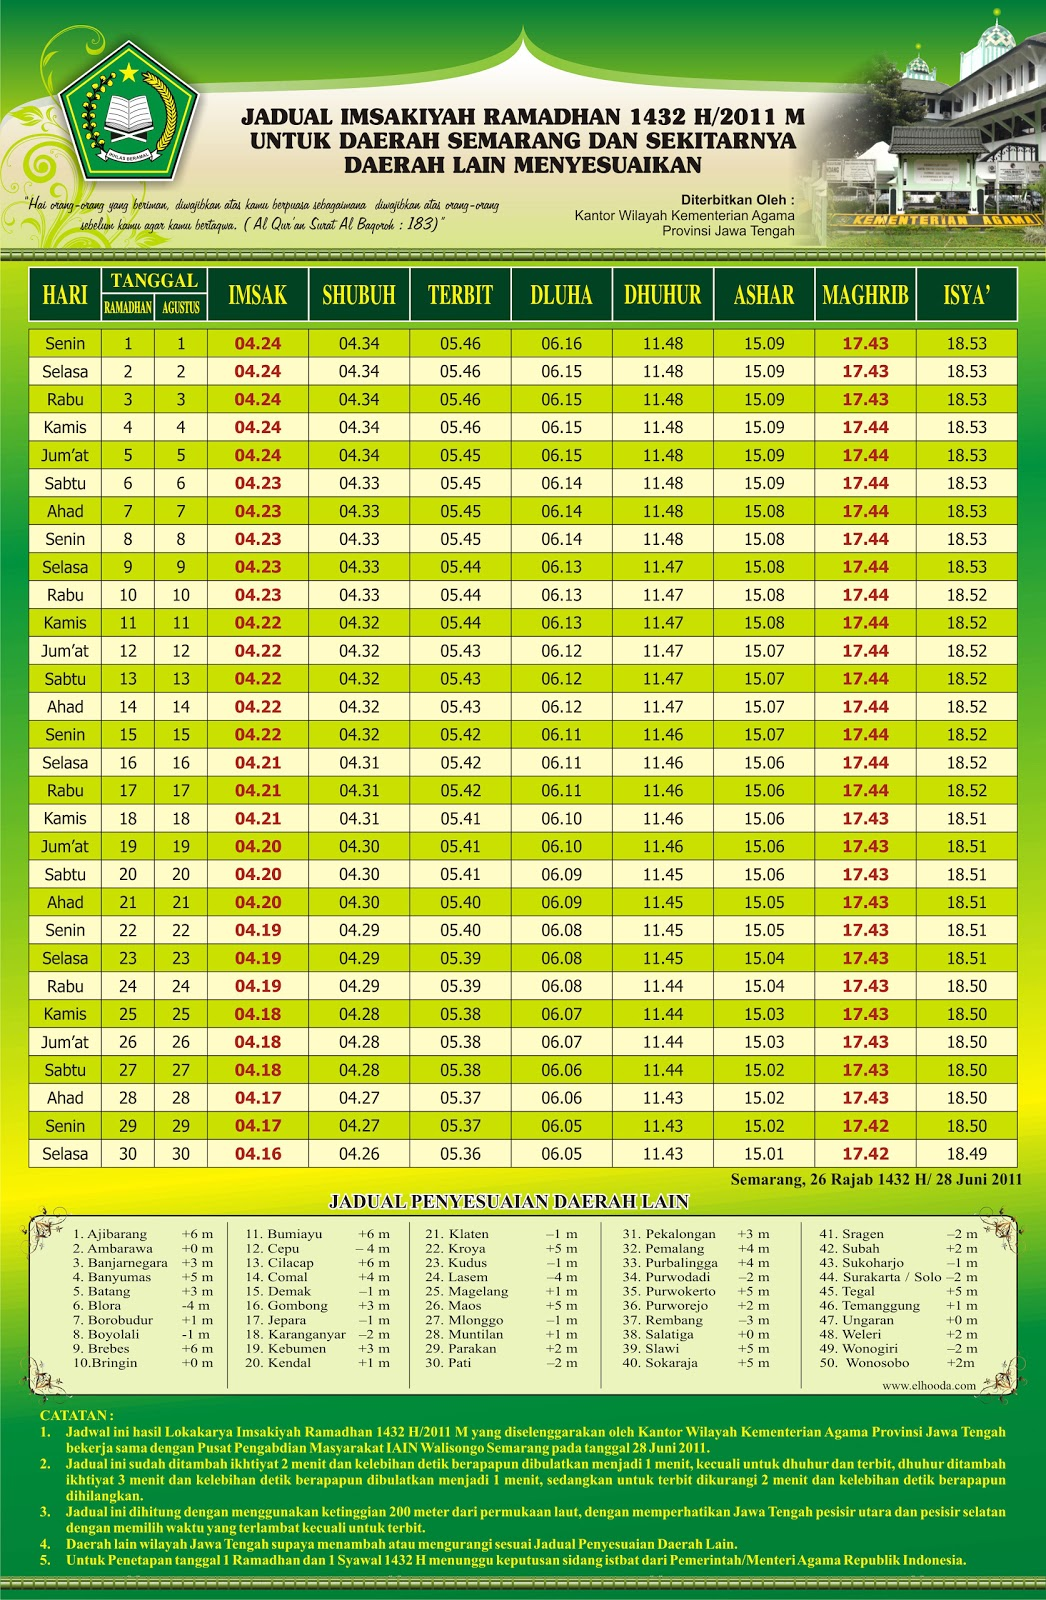 Download Jadwal Imsakiyah Ramadhan  M Untuk Provinsi Jawa Tengah Kota Semarang Kemenag Ri Ajibarang Ambarawa Banjarnegara Banyumas